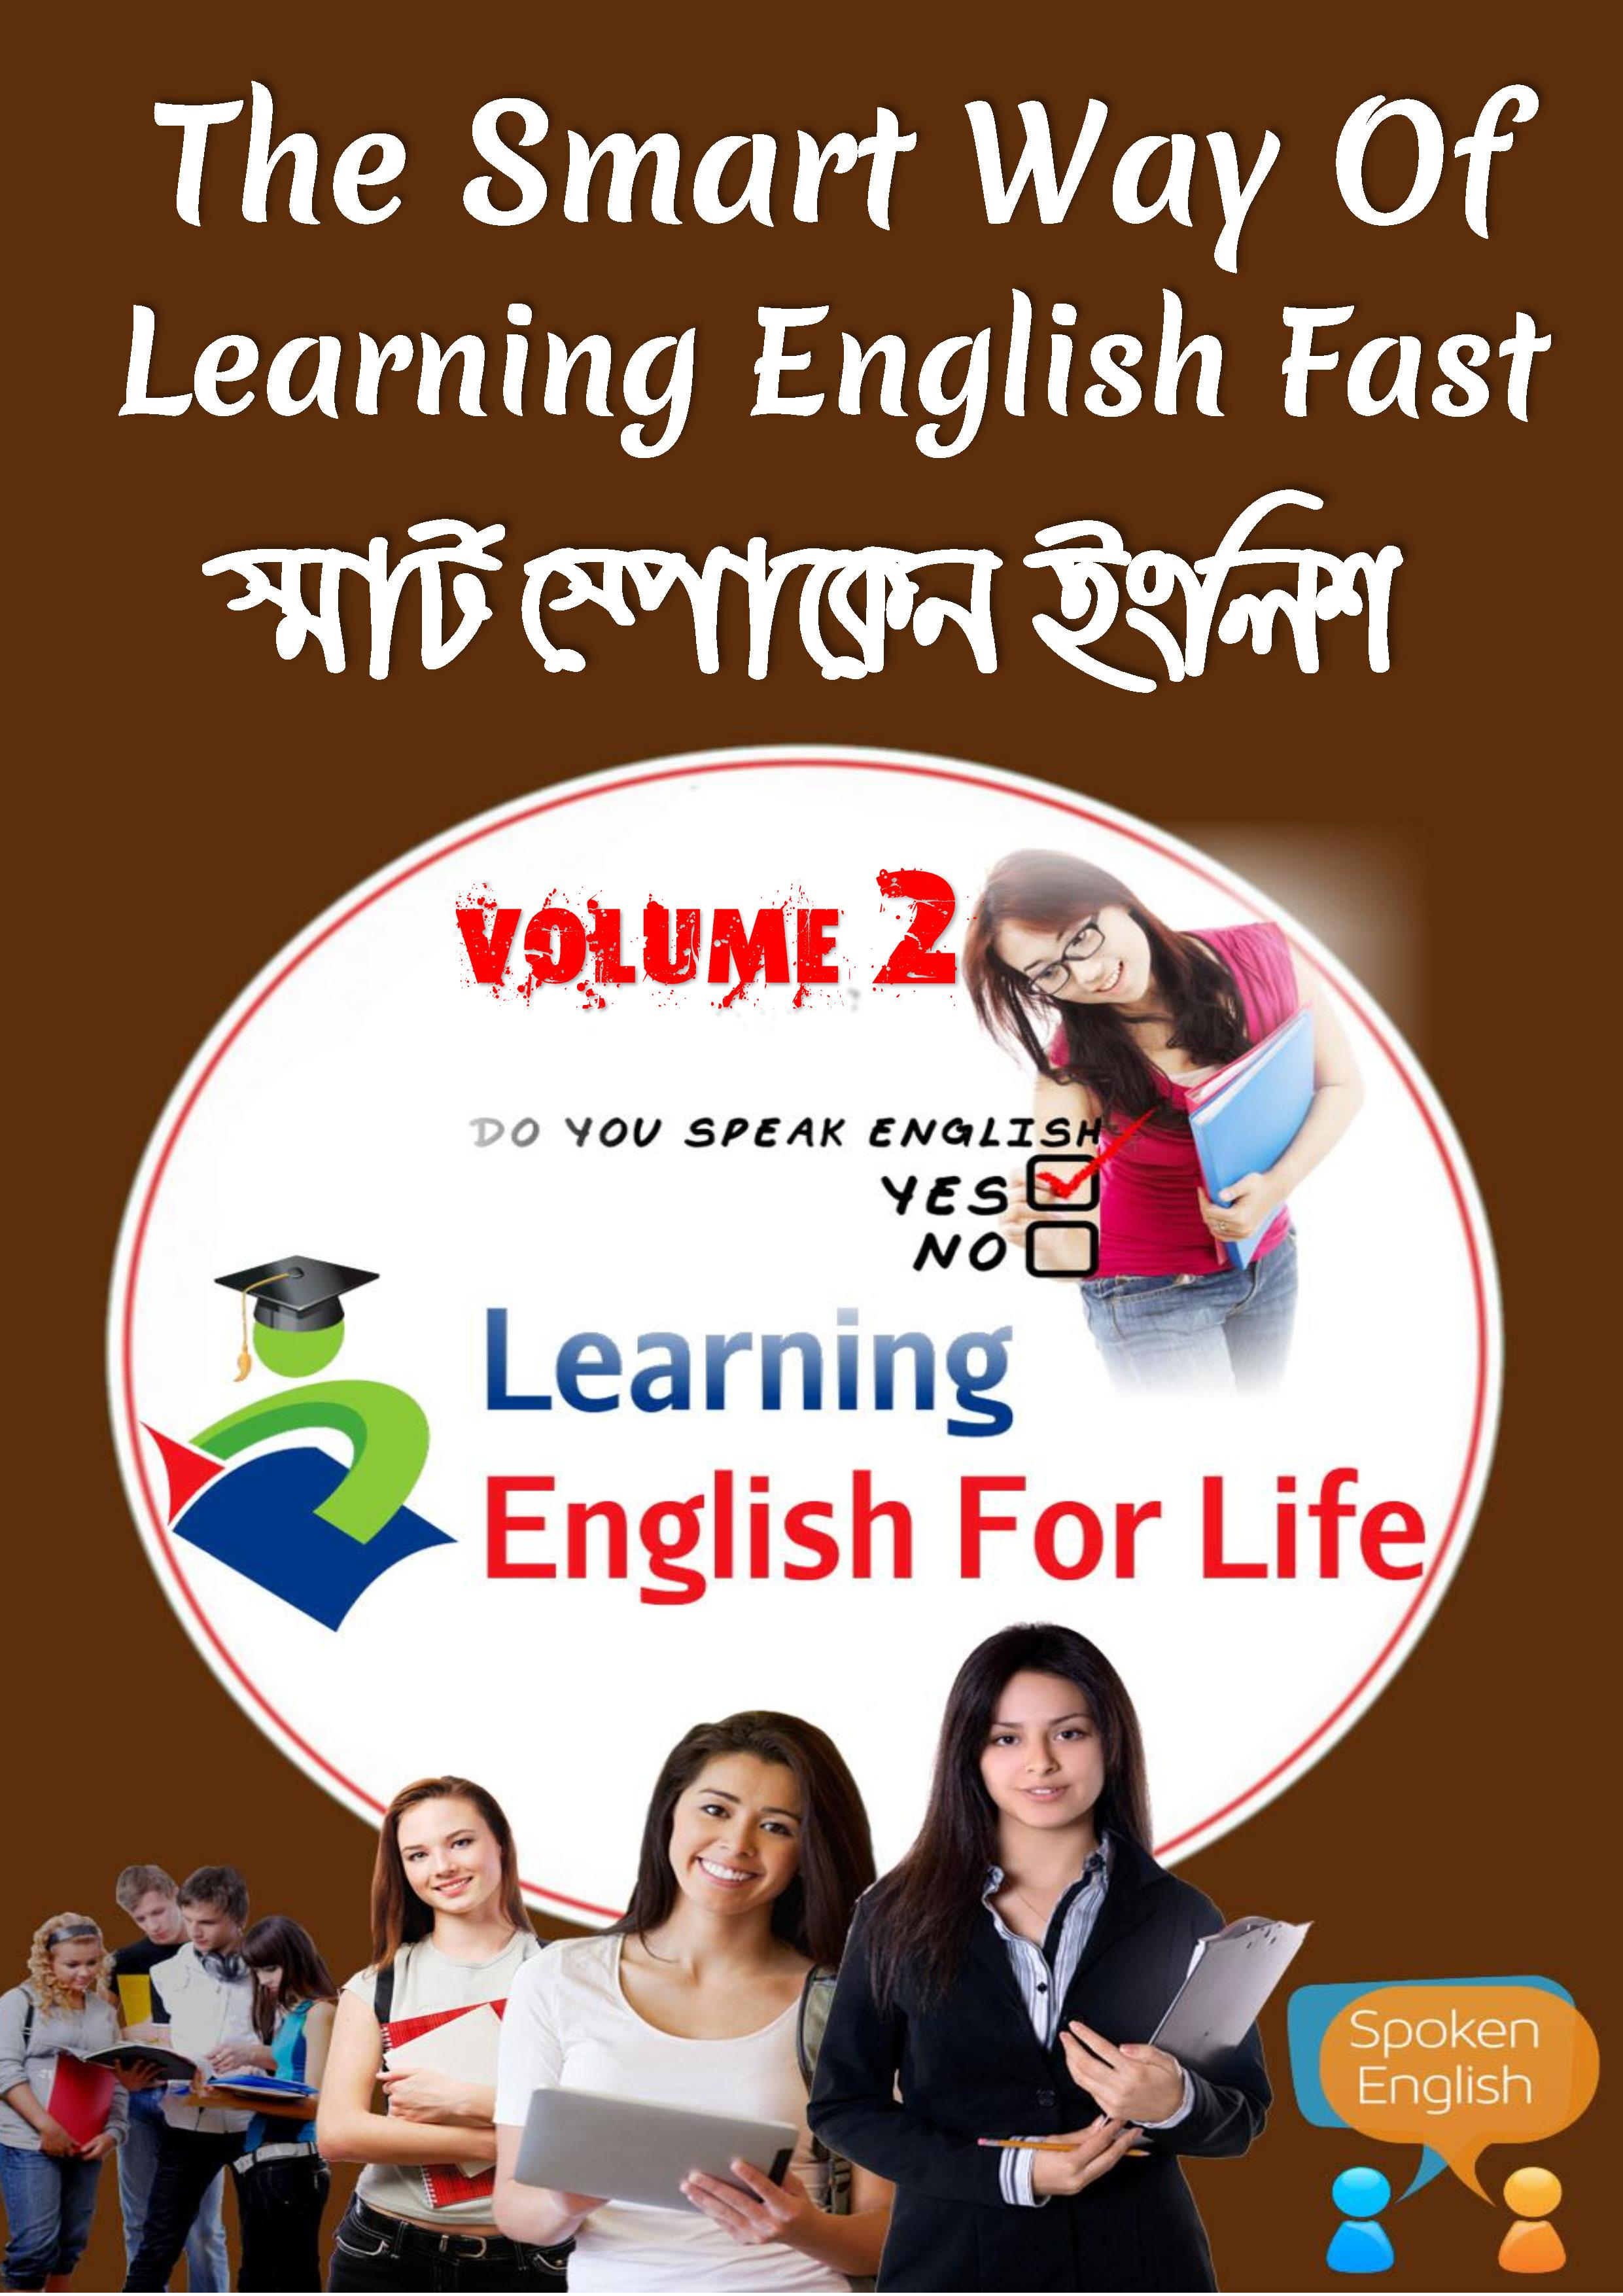 The Smart Way Of Learning English Fast 2 - ইংলিশ স্পোকেন শেখার স্মার্ট উপায় পার্ট 2